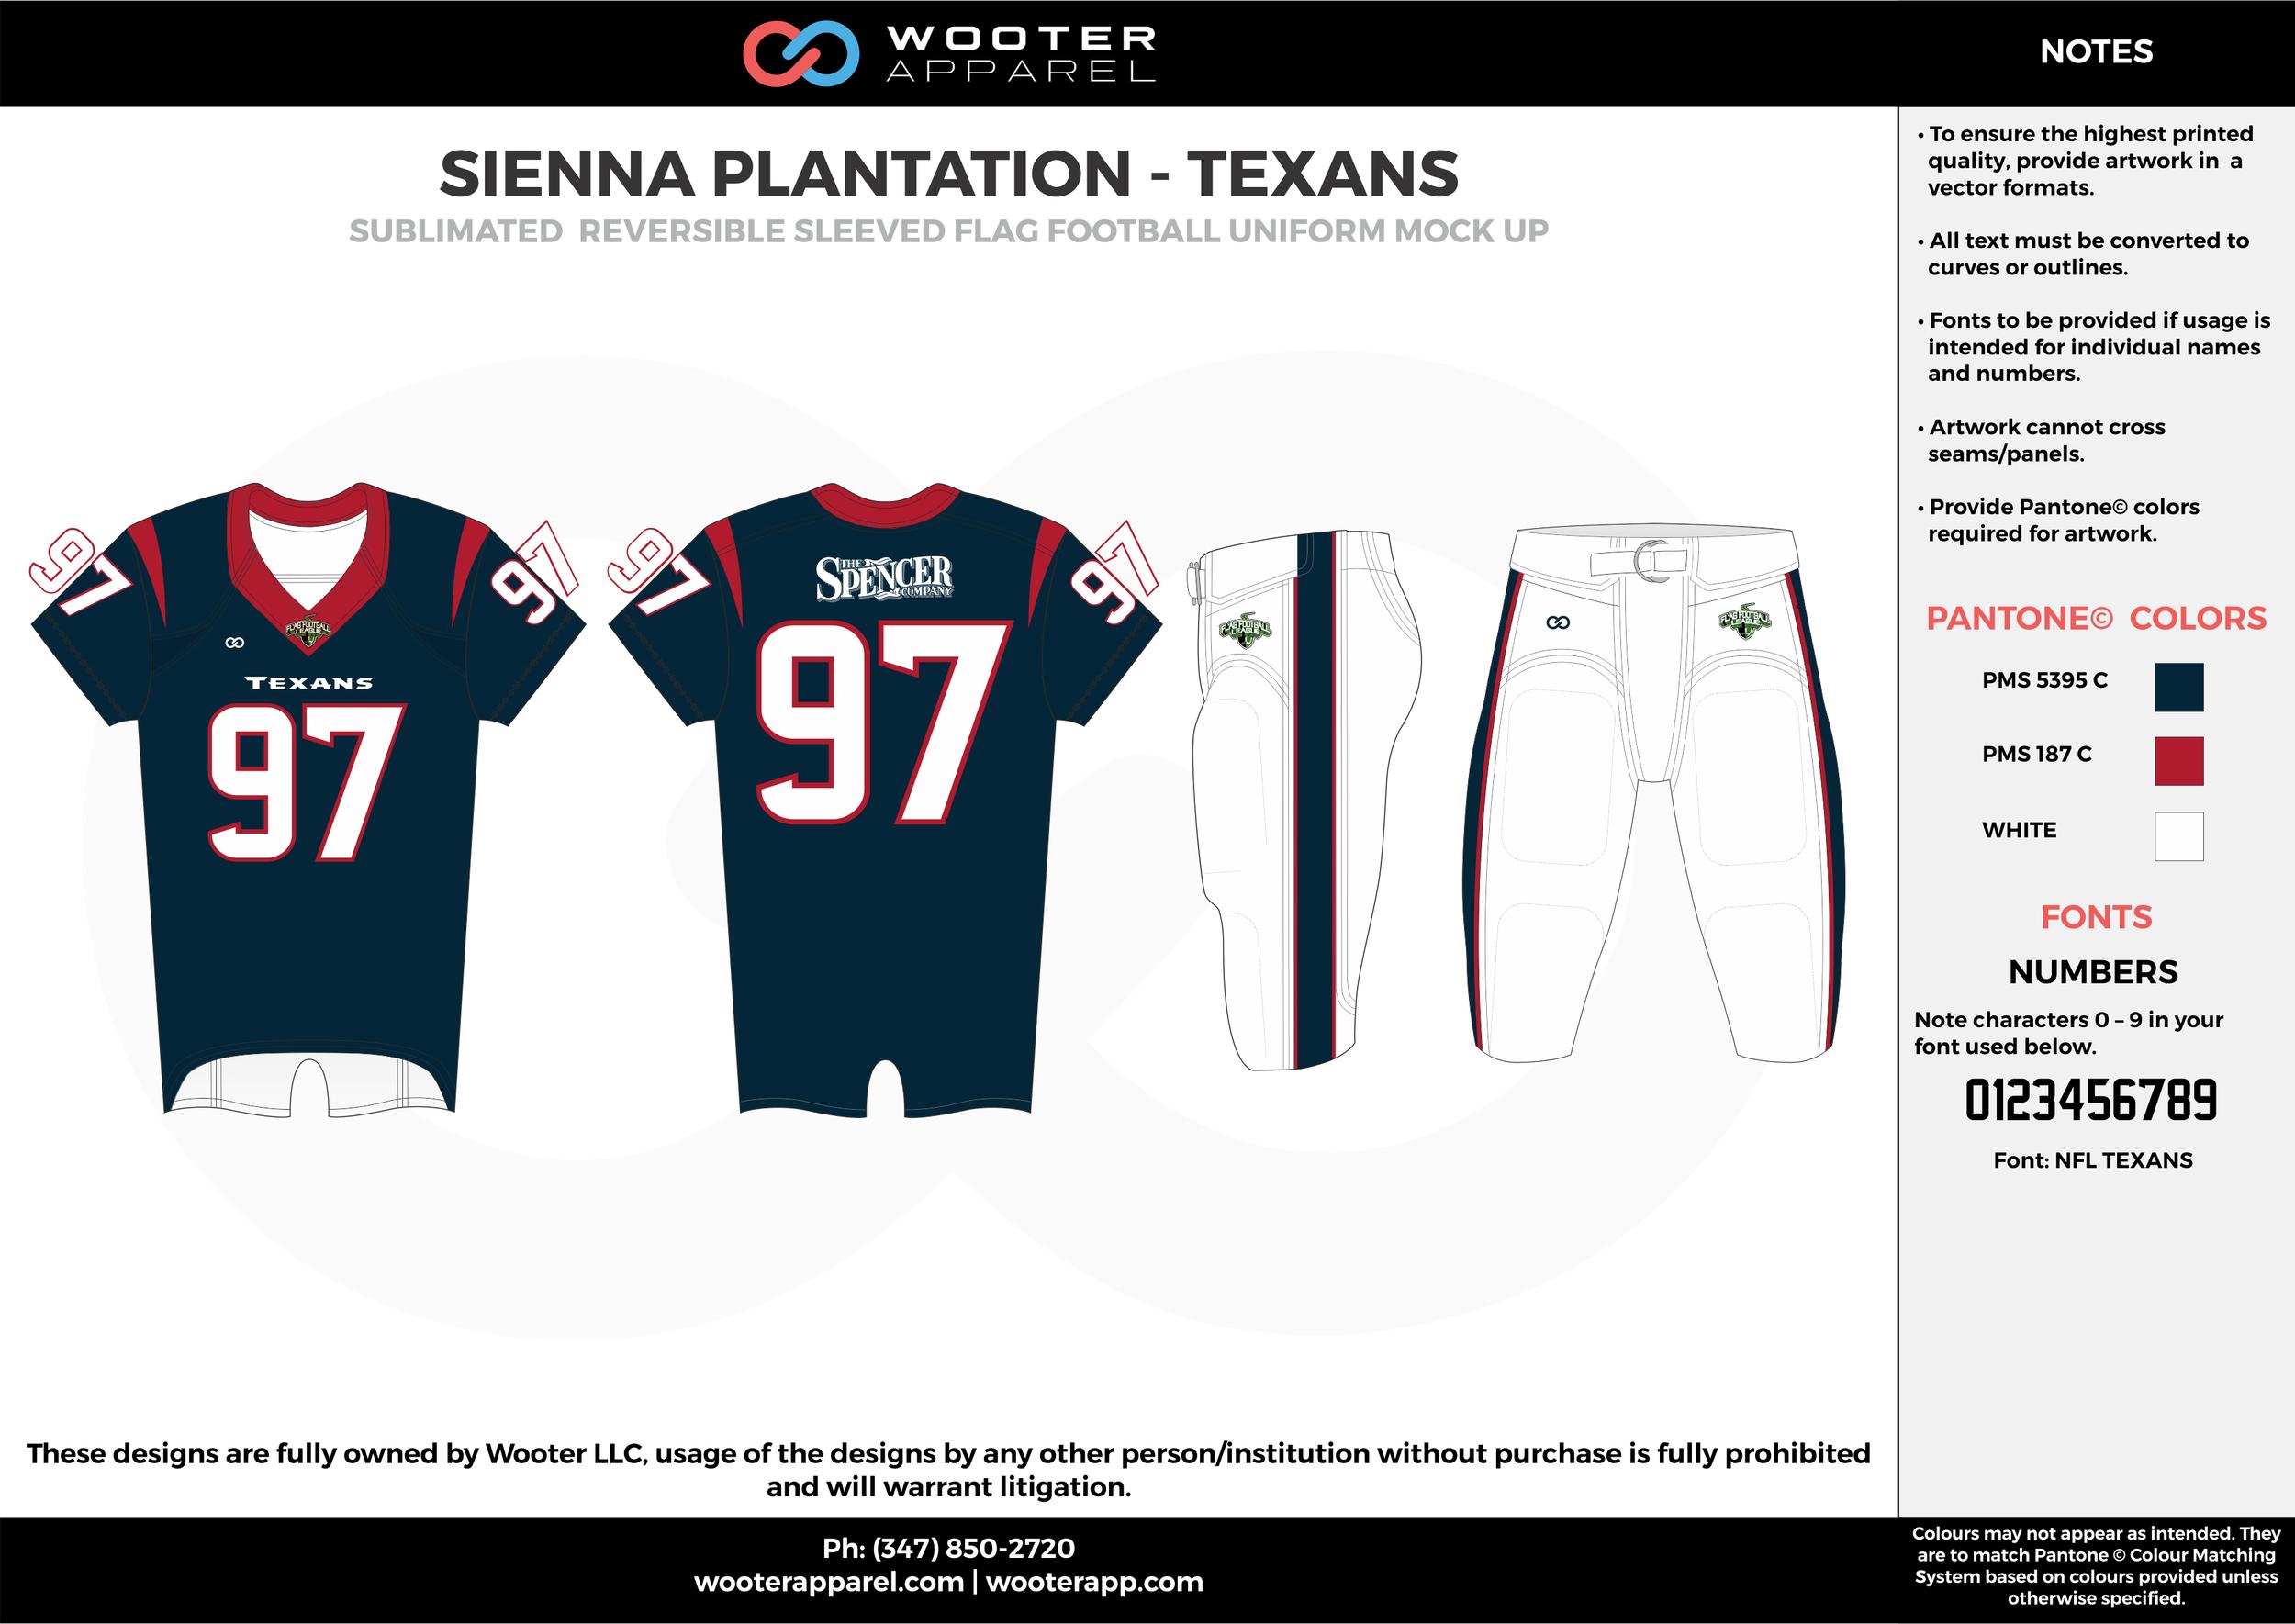 SIENNA PLANTATION - TEXANS  black red white Football Uniform, Jersey, Pants, Integraded